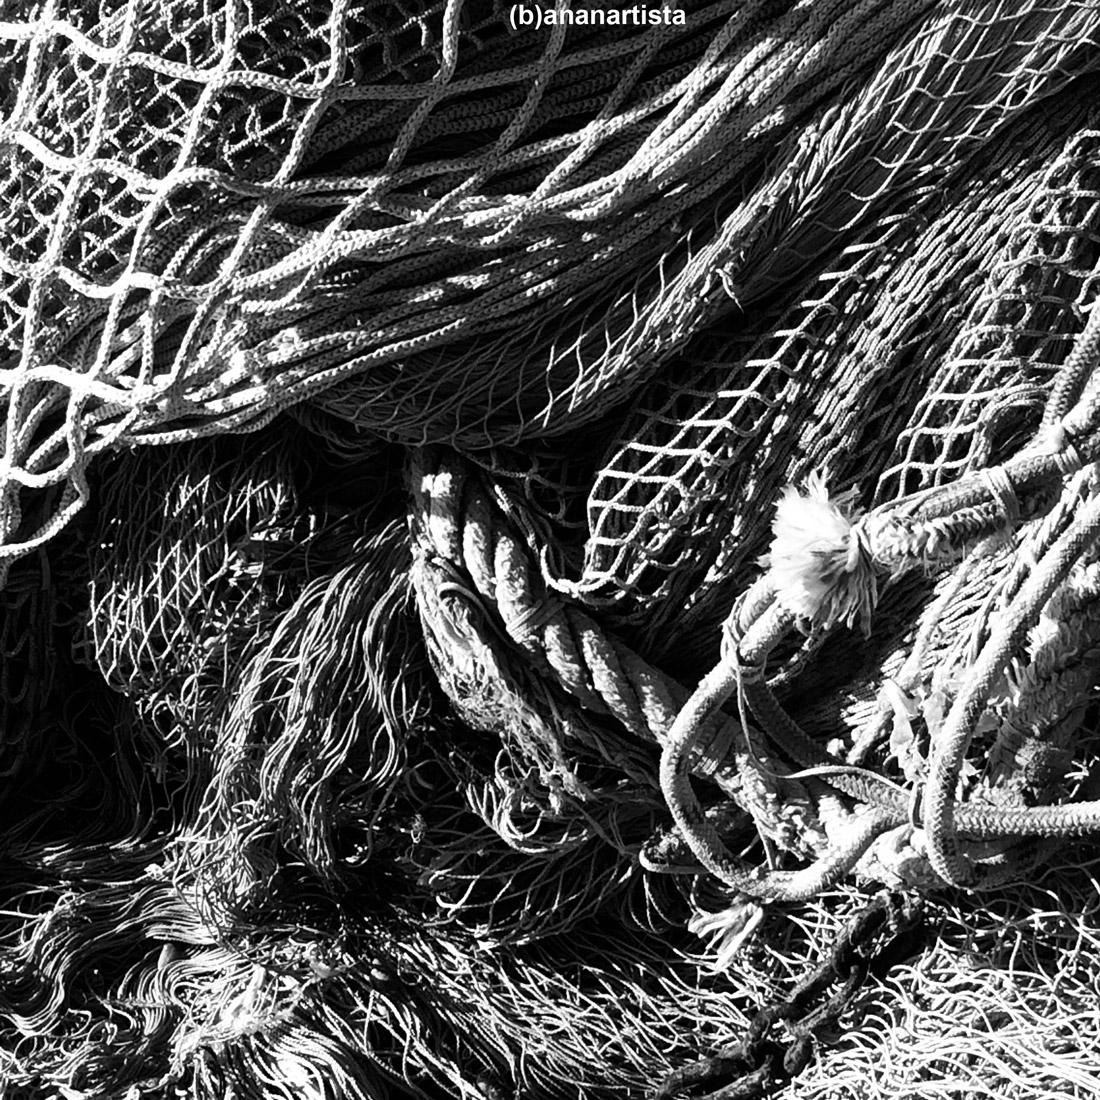 fishing net: photography by (b)ananartista sbuff